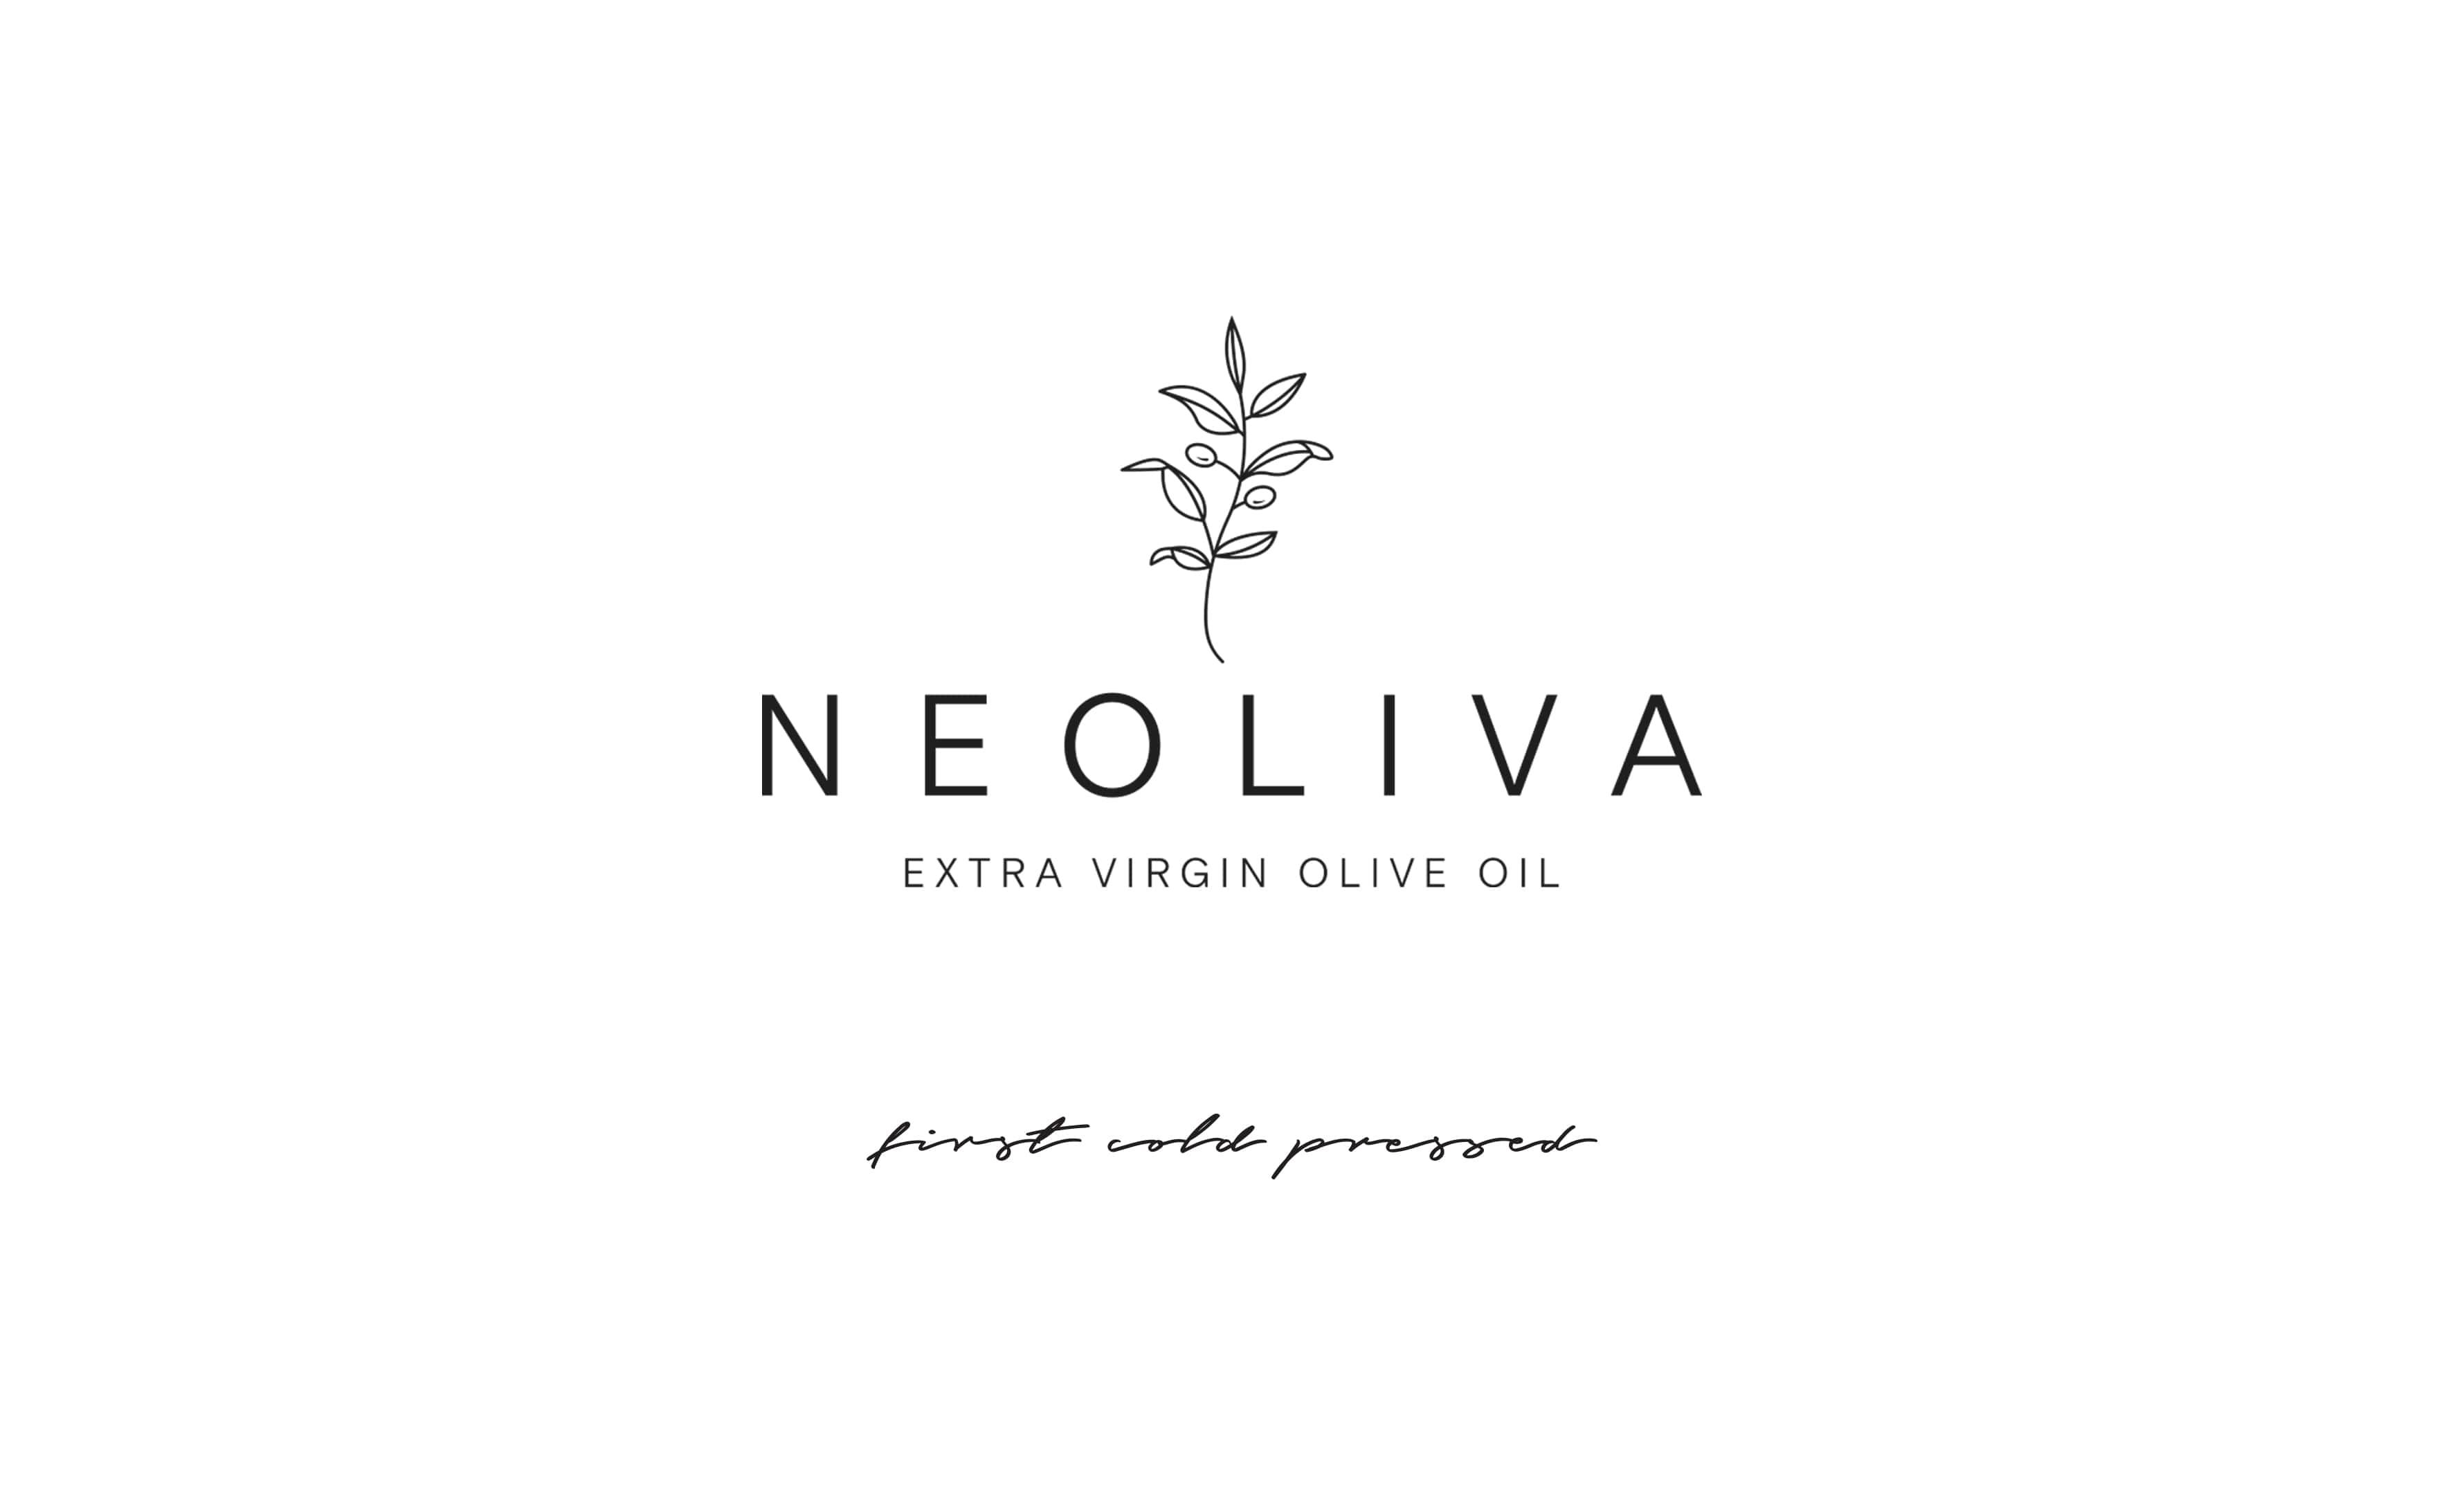 Neoliva-Gokten-Tut-Website-2